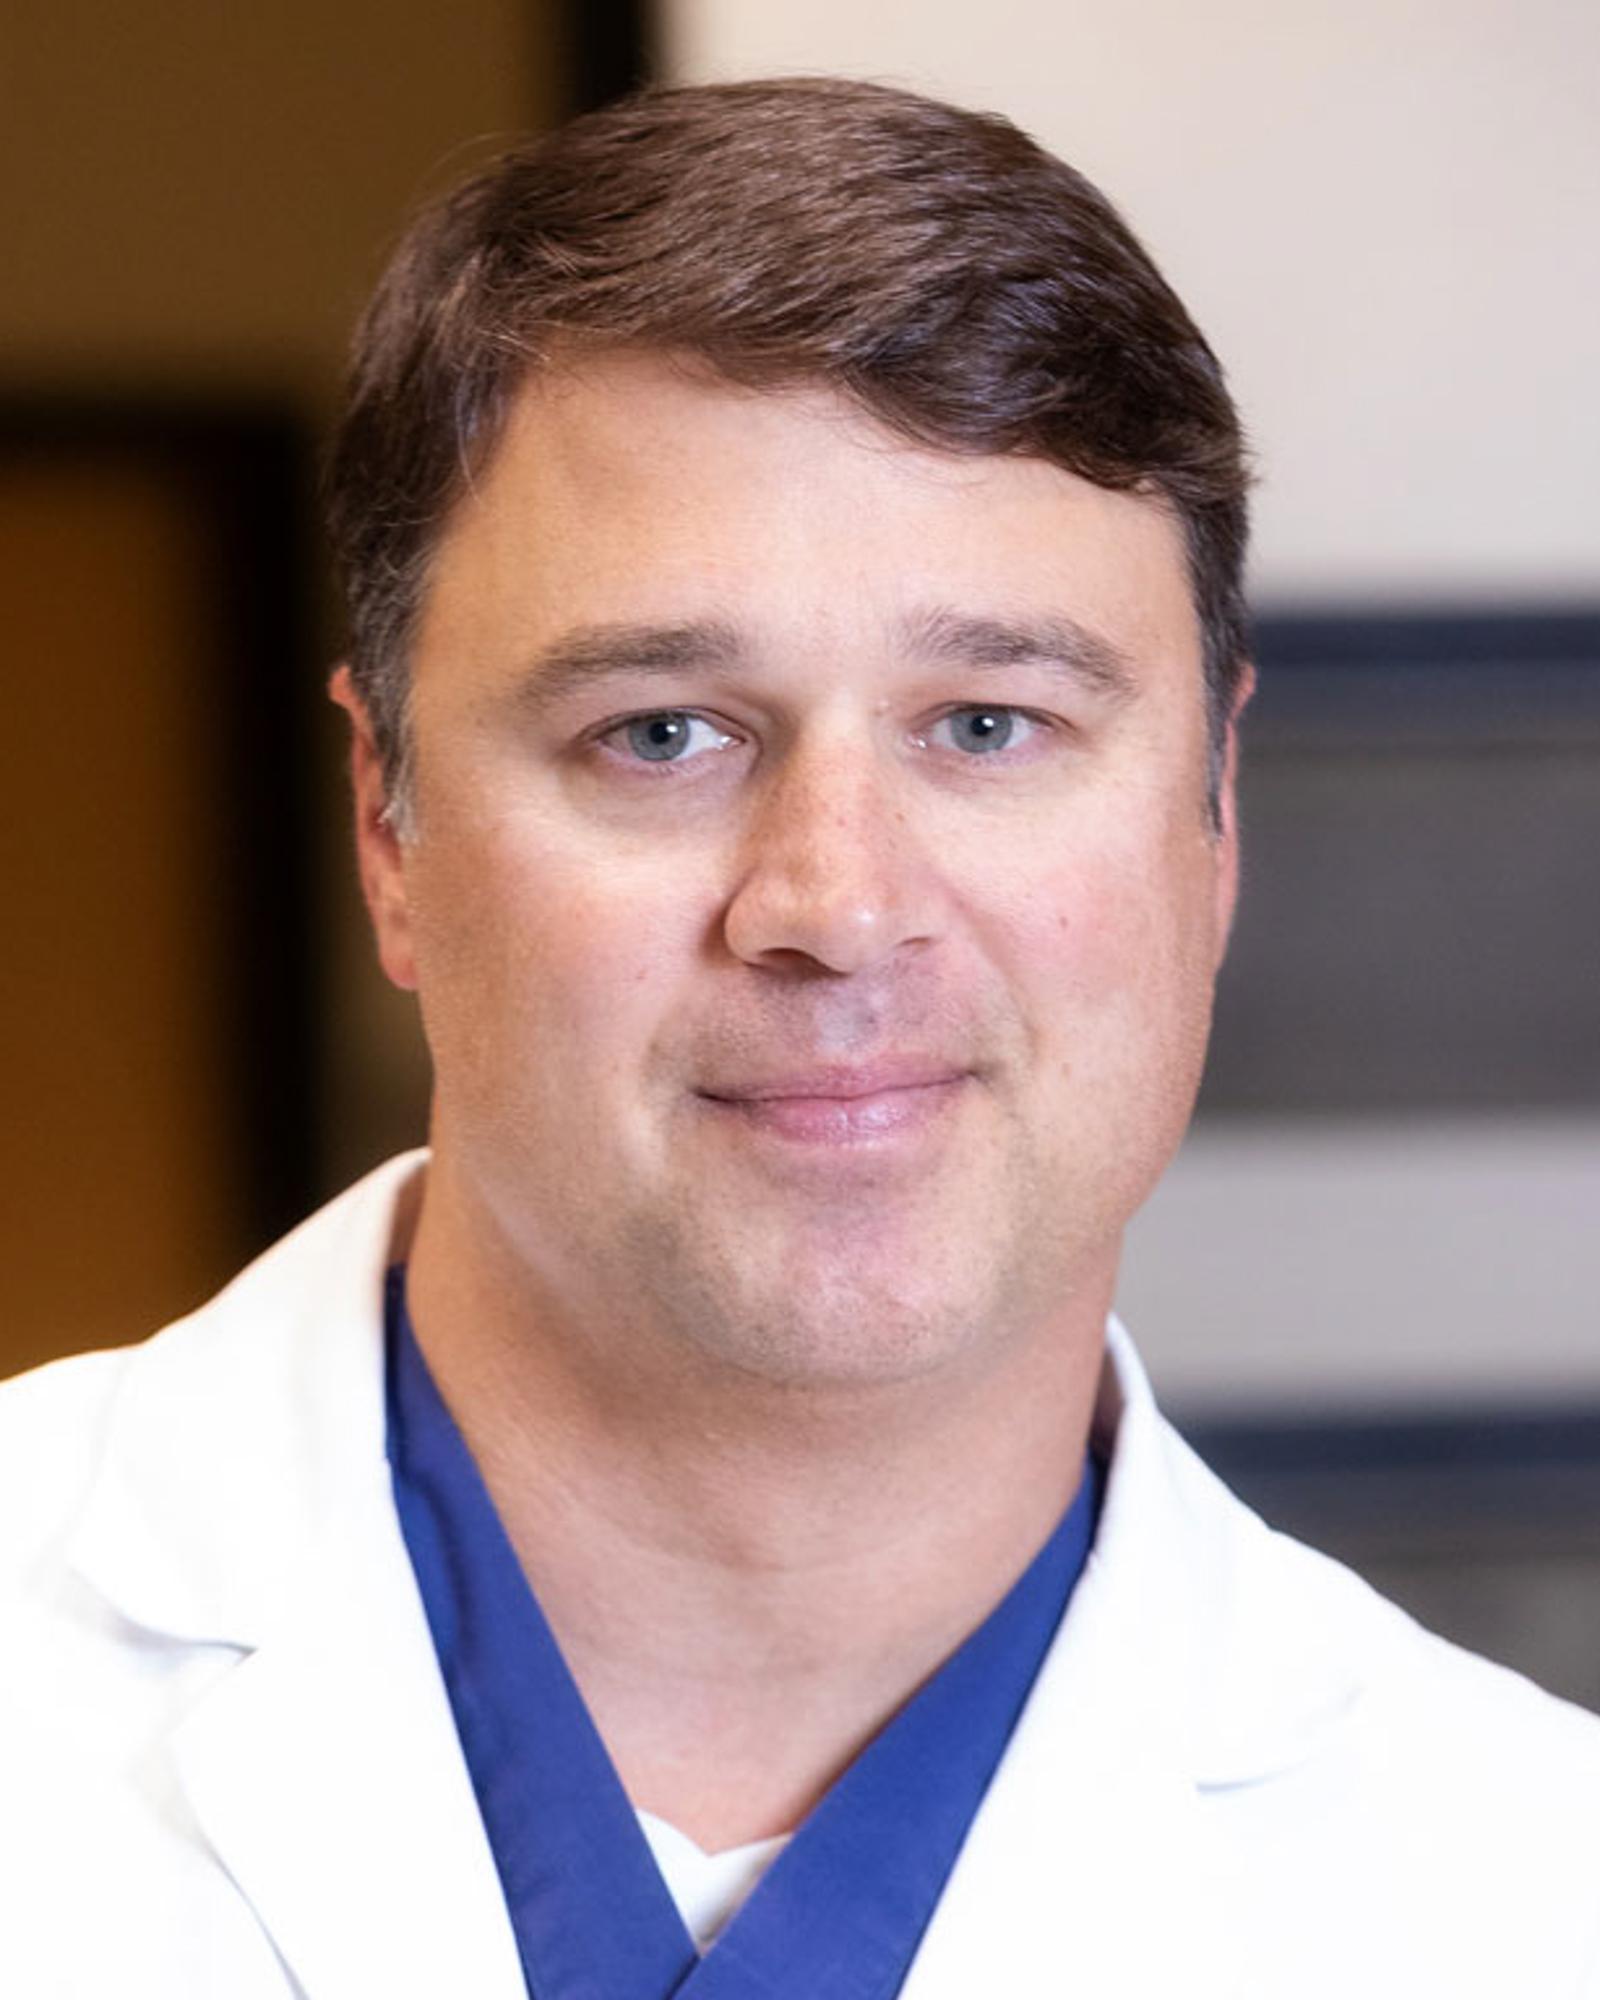 David G. Ferachi, M.D.